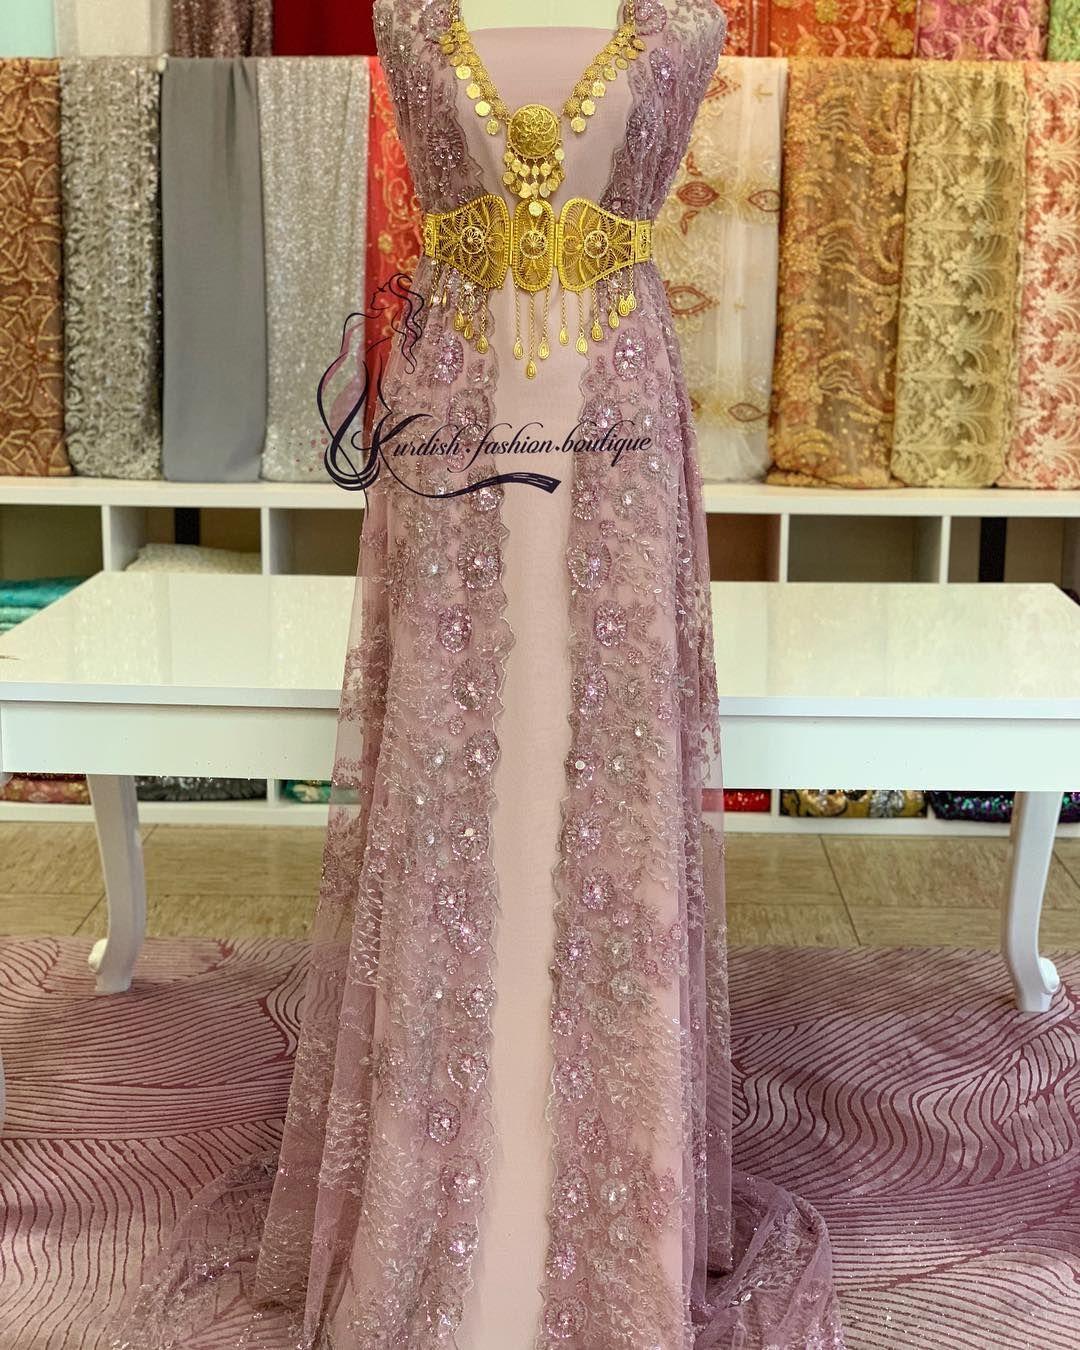 Now Available On Kurdish Fashion Boutique Huestrasse 160 45309